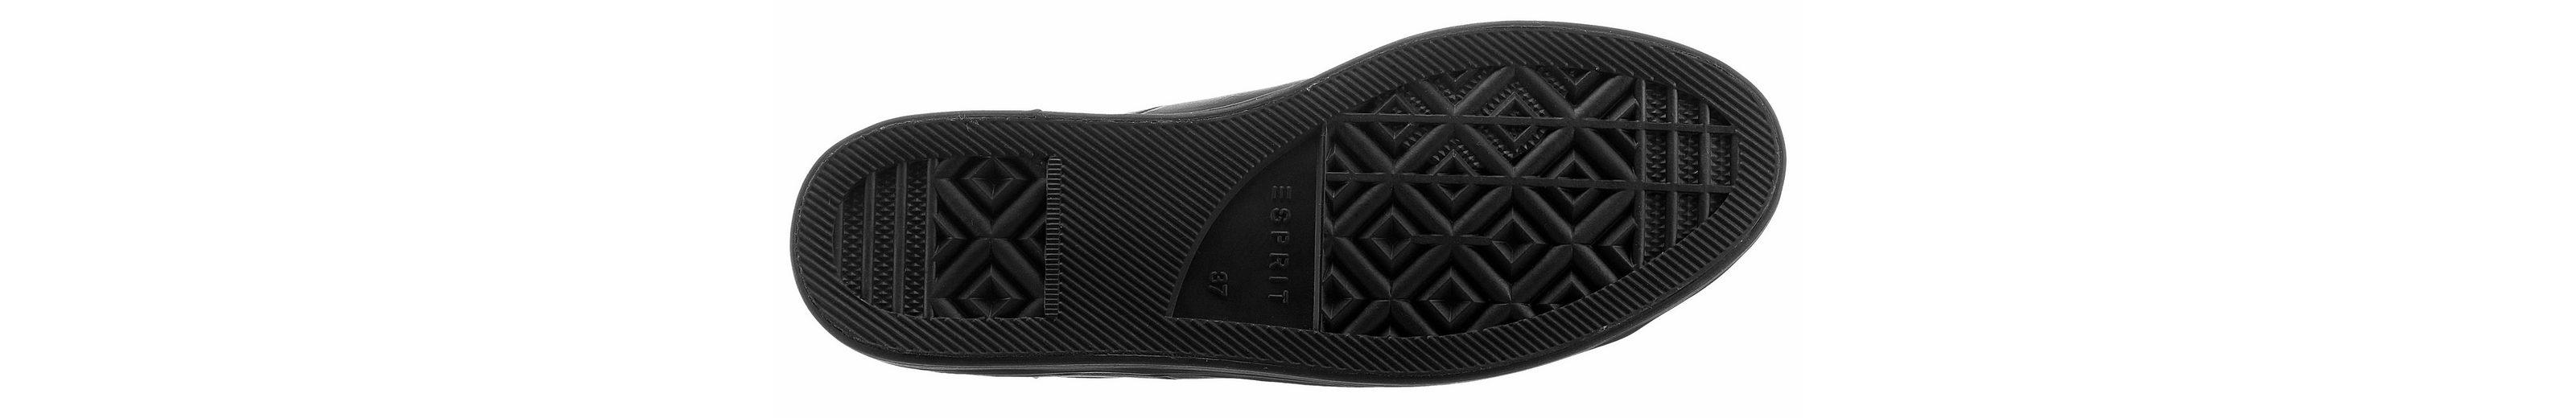 ESPRIT Sita Lace Up Sneaker, im Basic-Look